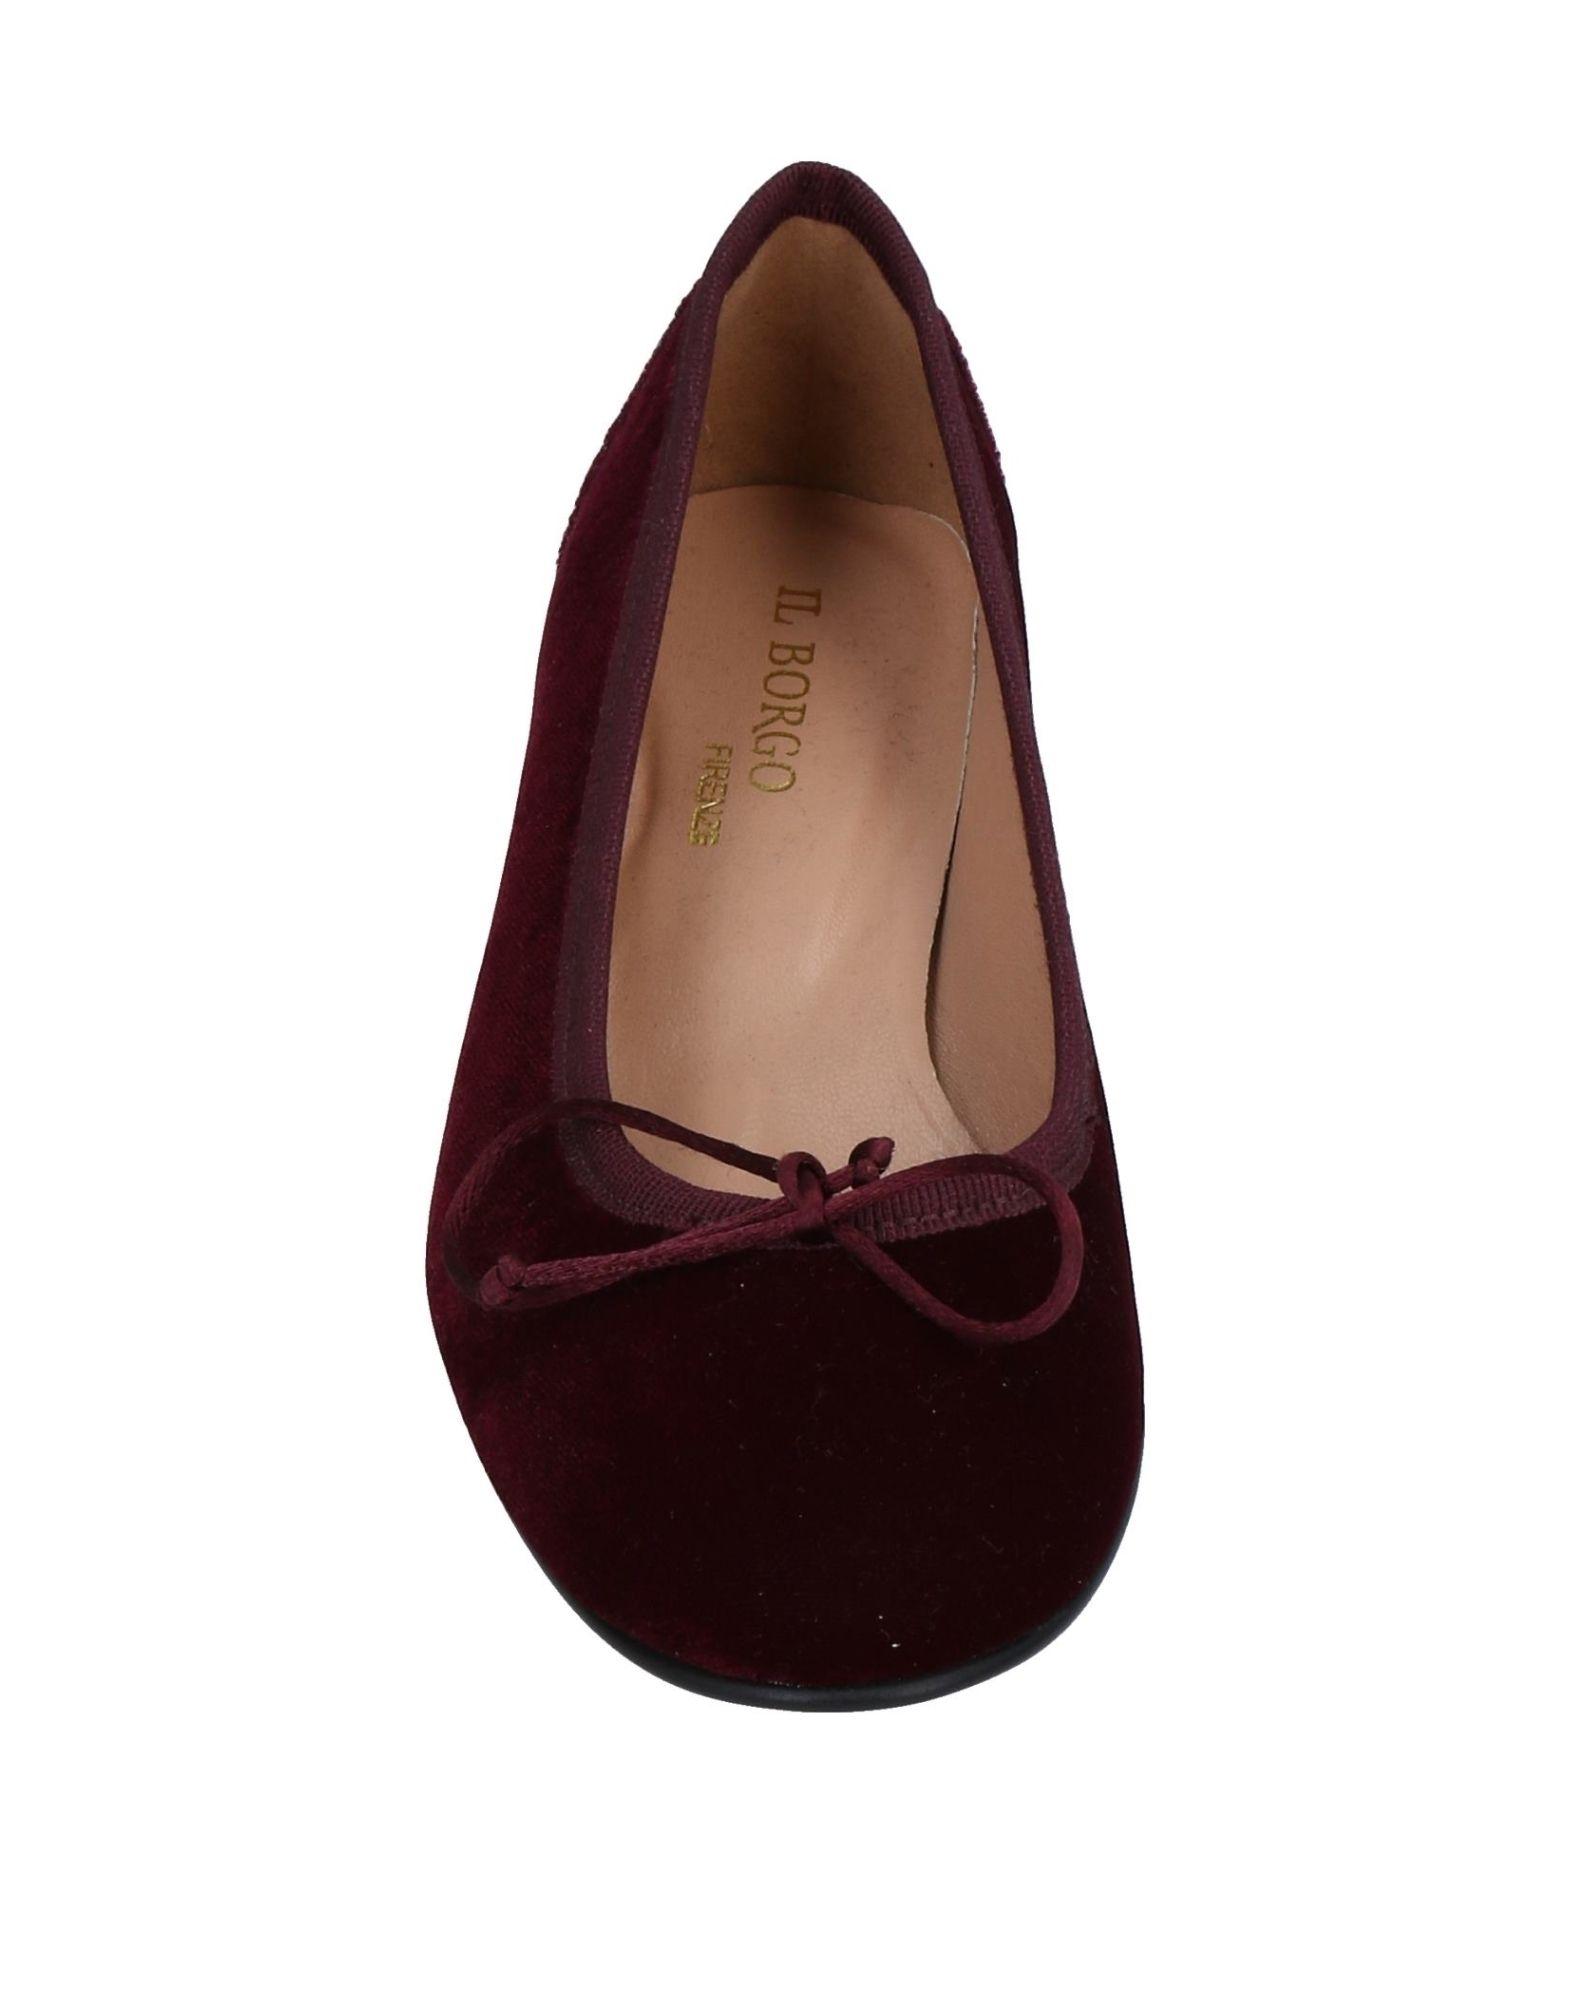 Il Borgo Firenze 11491230EE Ballerinas Damen  11491230EE Firenze Neue Schuhe ca327b